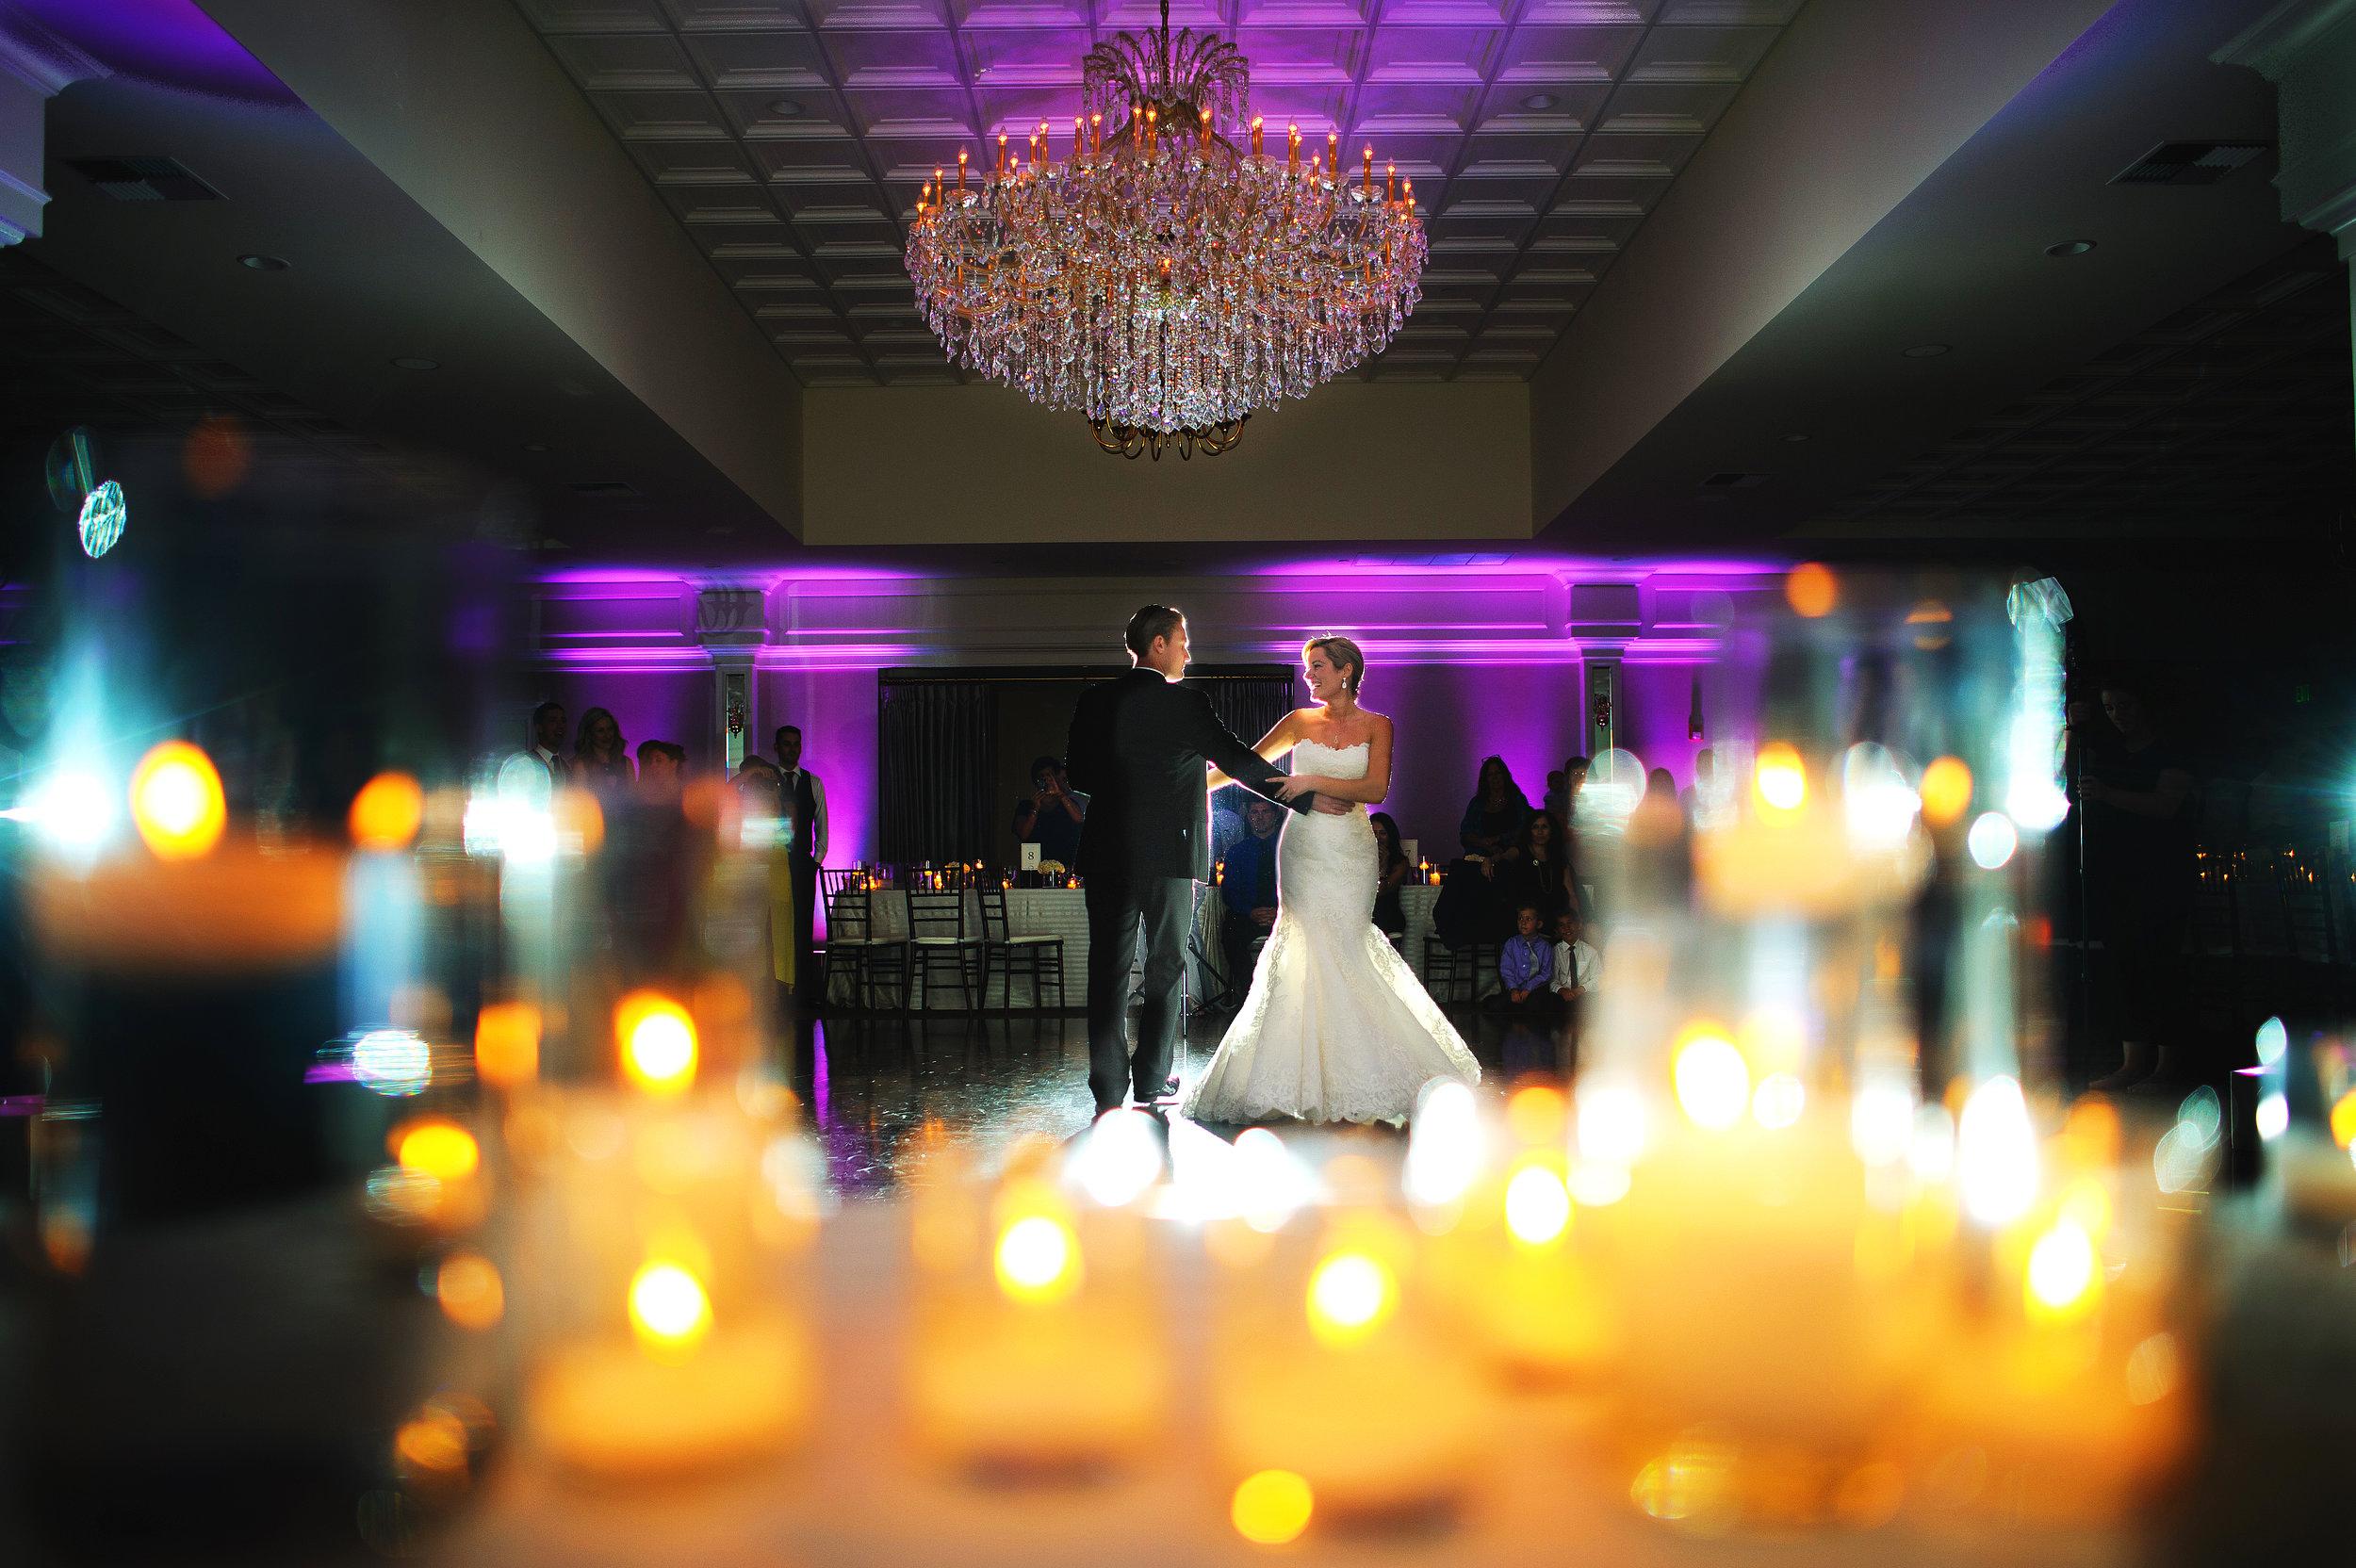 jennifer-dave-013-arden-hills-sacramento-wedding-photographer-katherine-nicole-photography.JPG